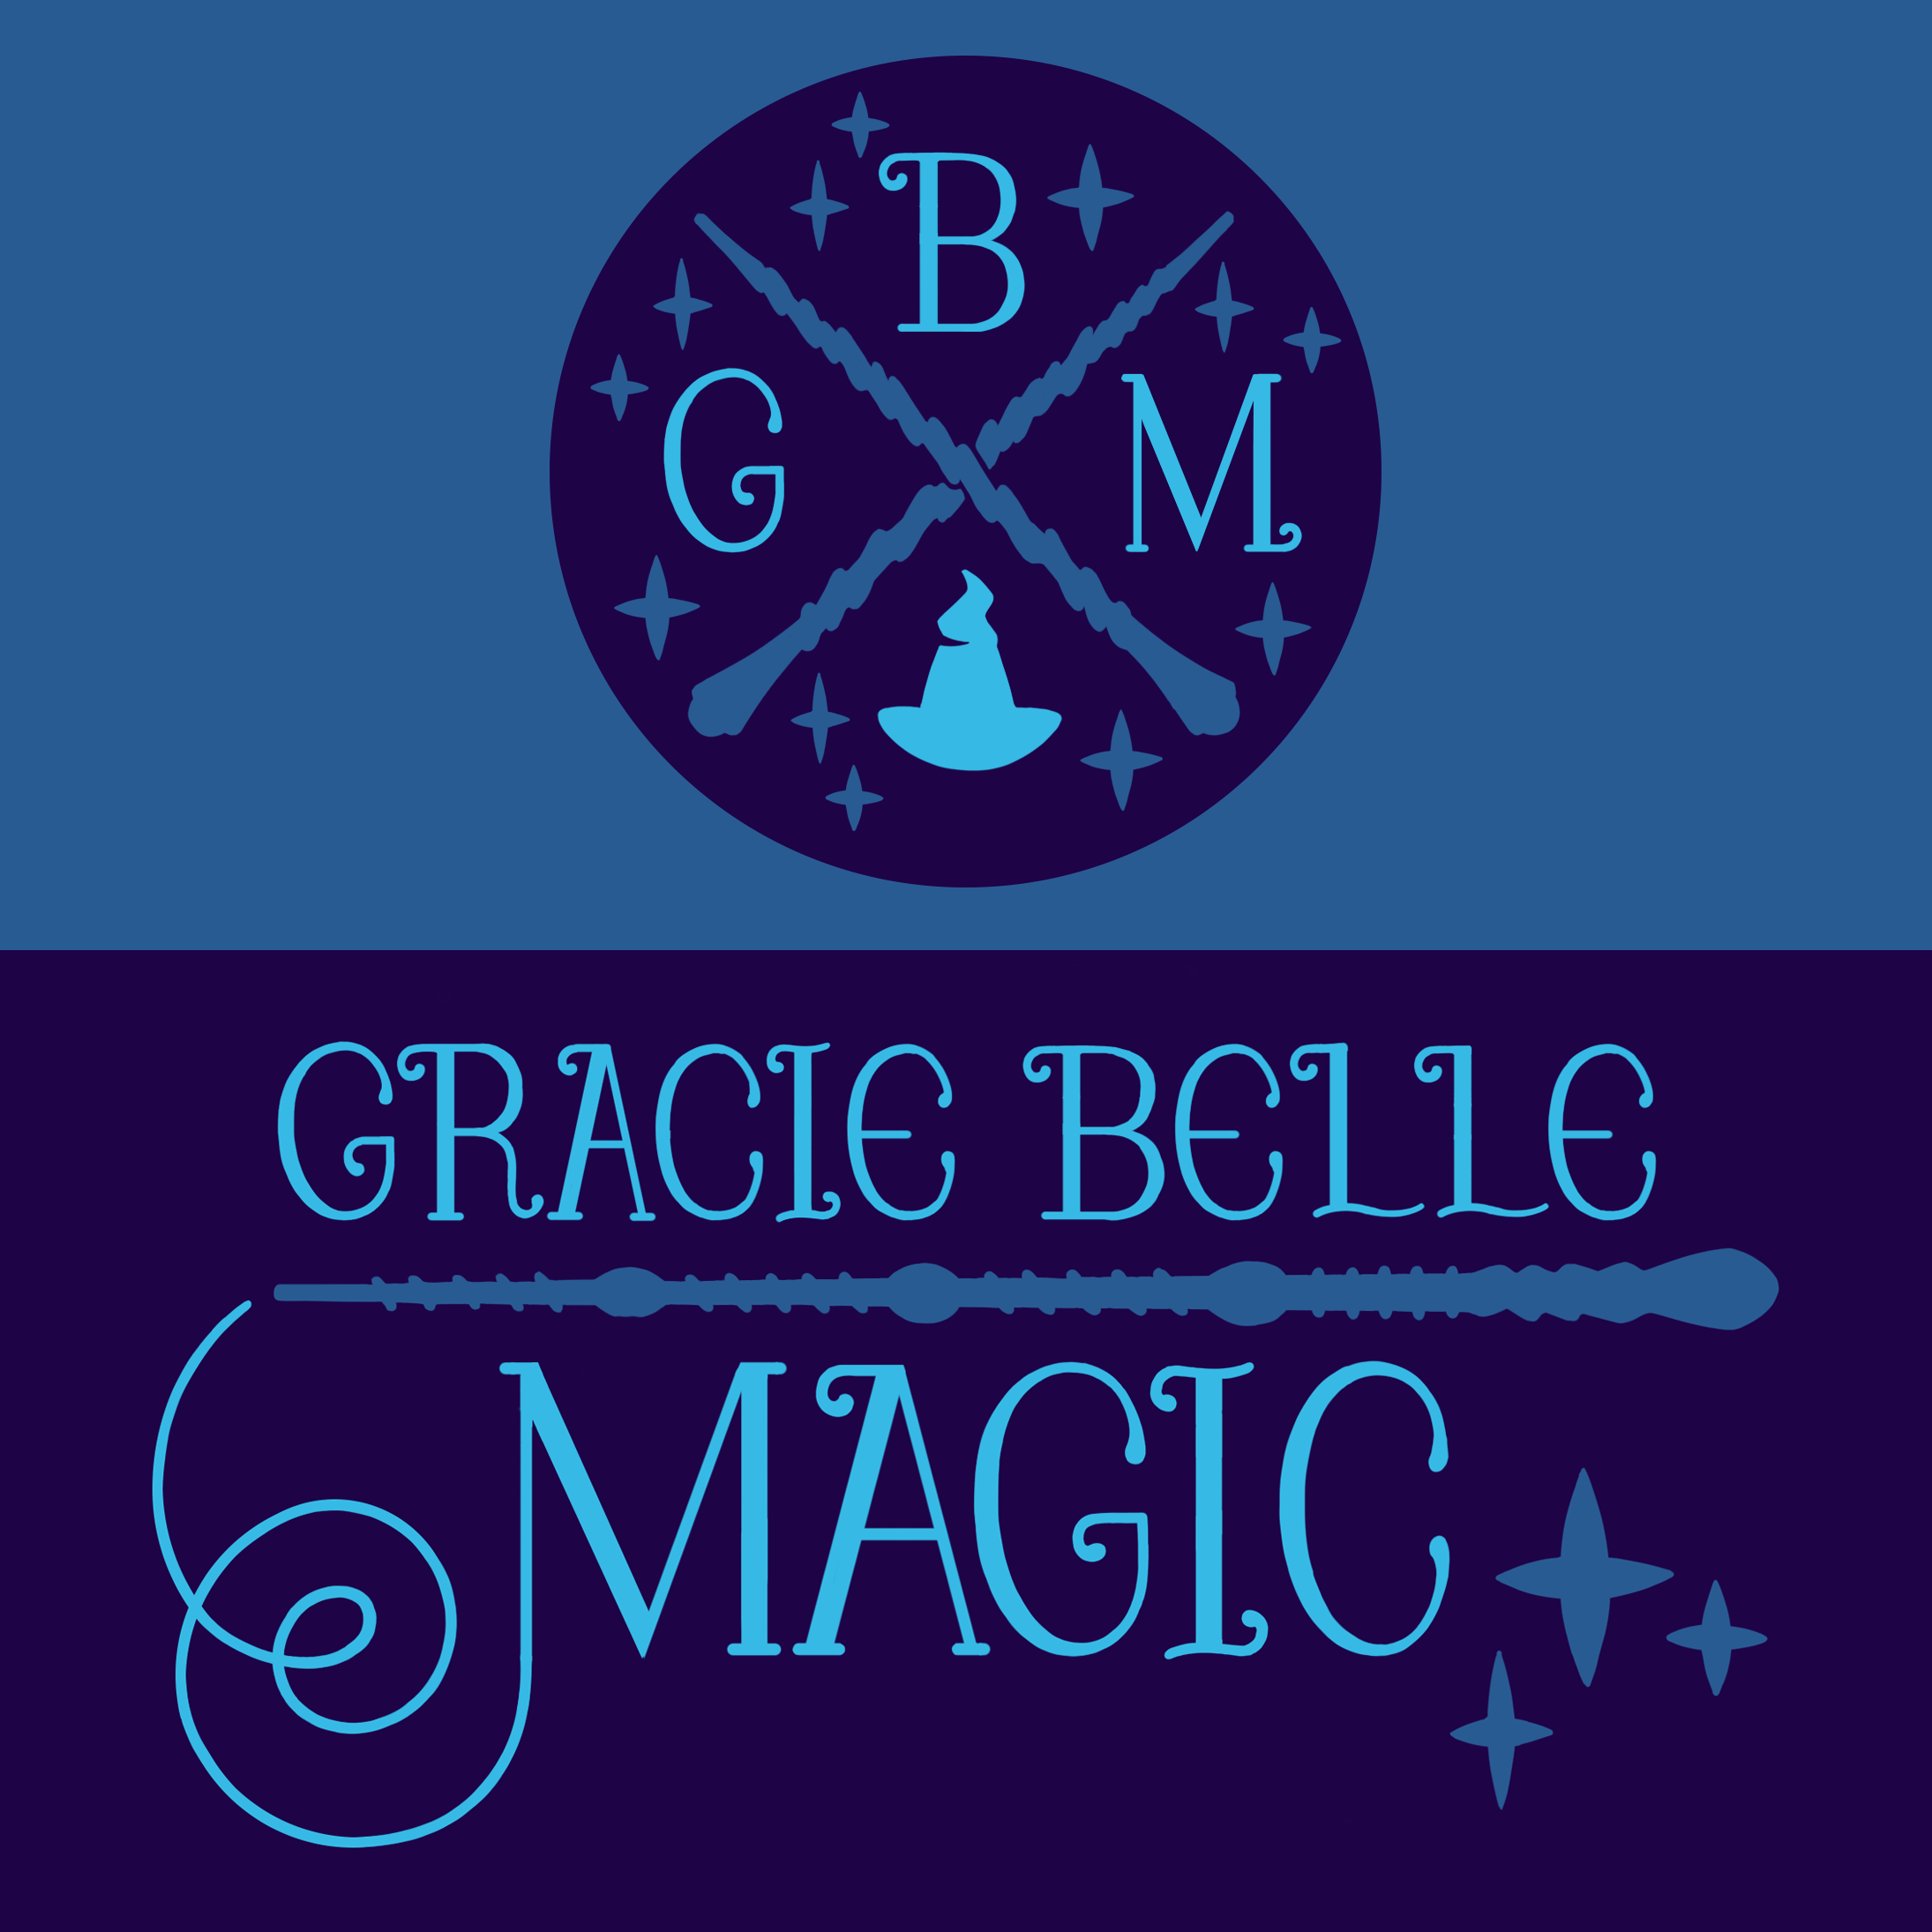 Gracie Belle Magic Logo